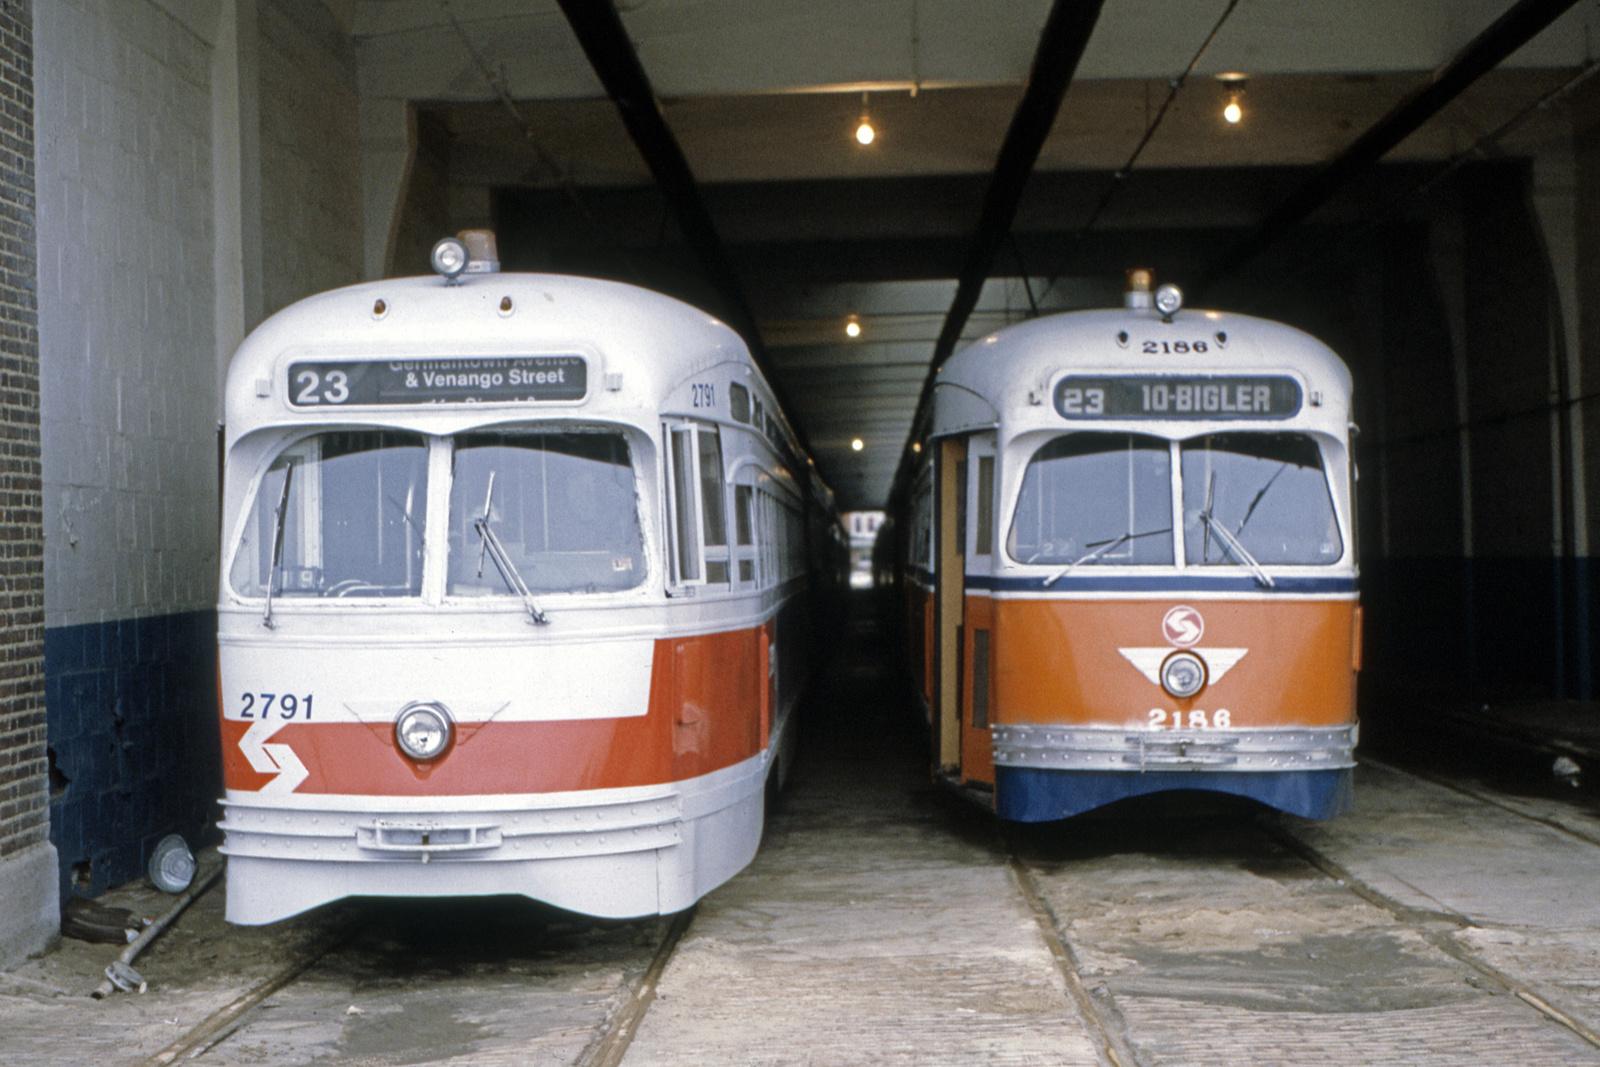 (686k, 1600x1067)<br><b>Country:</b> United States<br><b>City:</b> Philadelphia, PA<br><b>System:</b> SEPTA (or Predecessor)<br><b>Line:</b> Rt. 23-Germantown<br><b>Location:</b> Germantown Depot<br><b>Car:</b> PTC/SEPTA Postwar All-electric PCC (St.Louis, 1947) 2791/2186 <br><b>Collection of:</b> David Pirmann<br><b>Date:</b> 8/1983<br><b>Viewed (this week/total):</b> 0 / 52